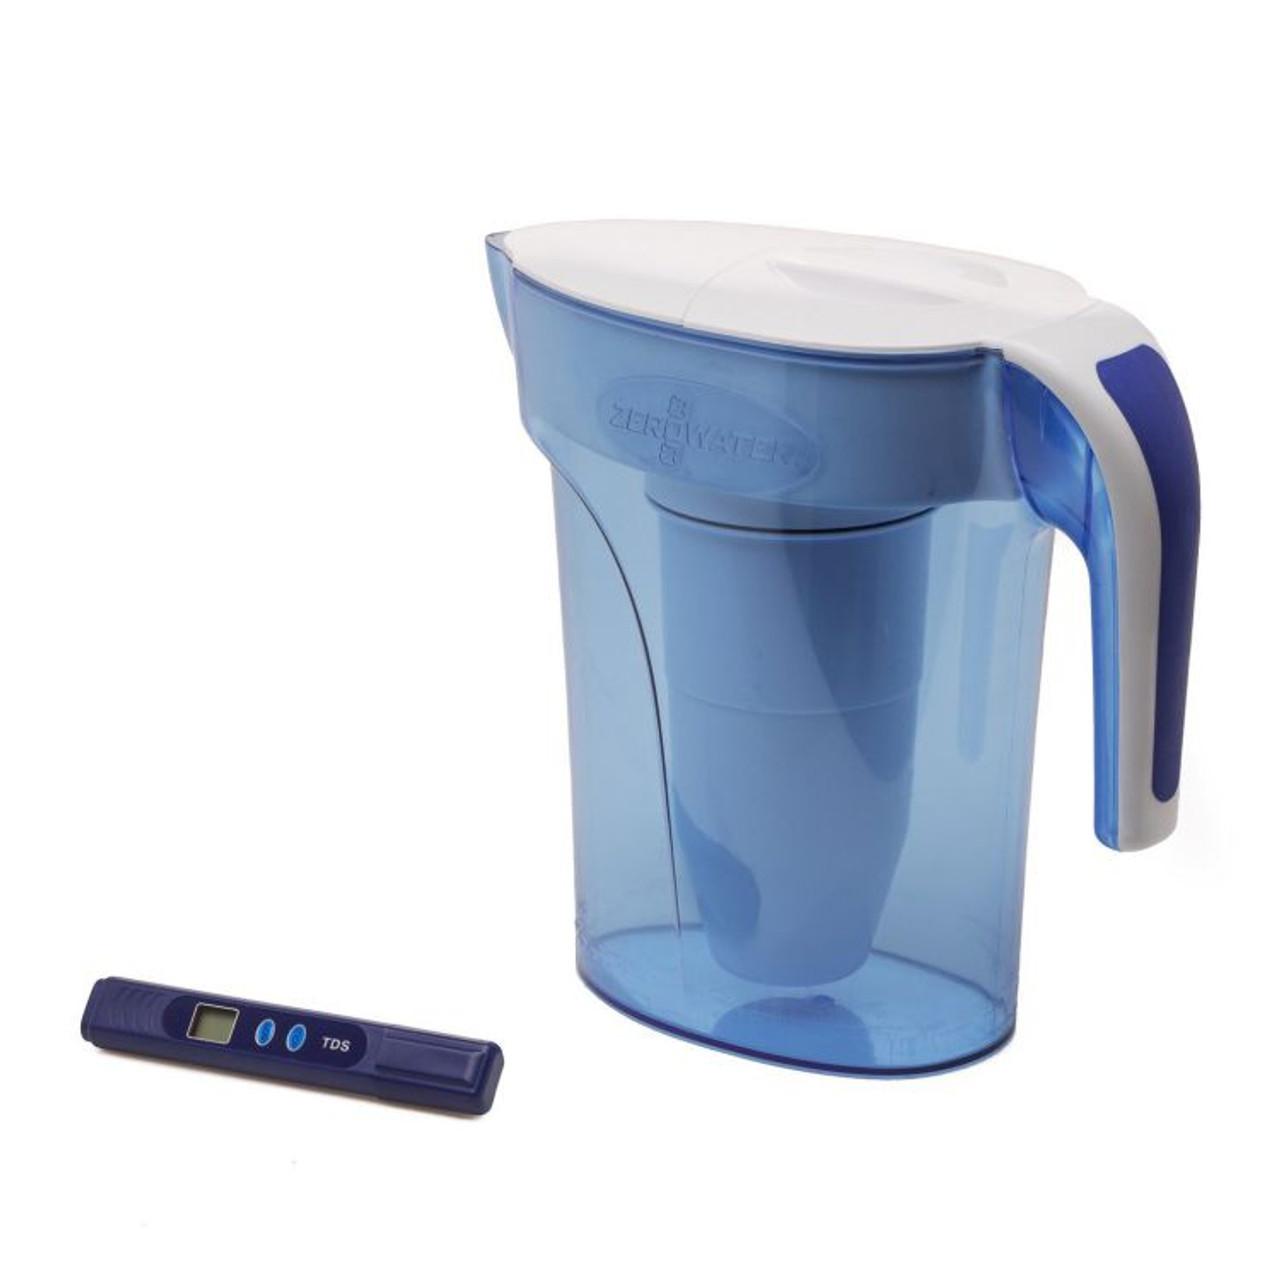 Zerowater Slim Water Filter Jug 7 Cup 1 66 Litre Healthy Home